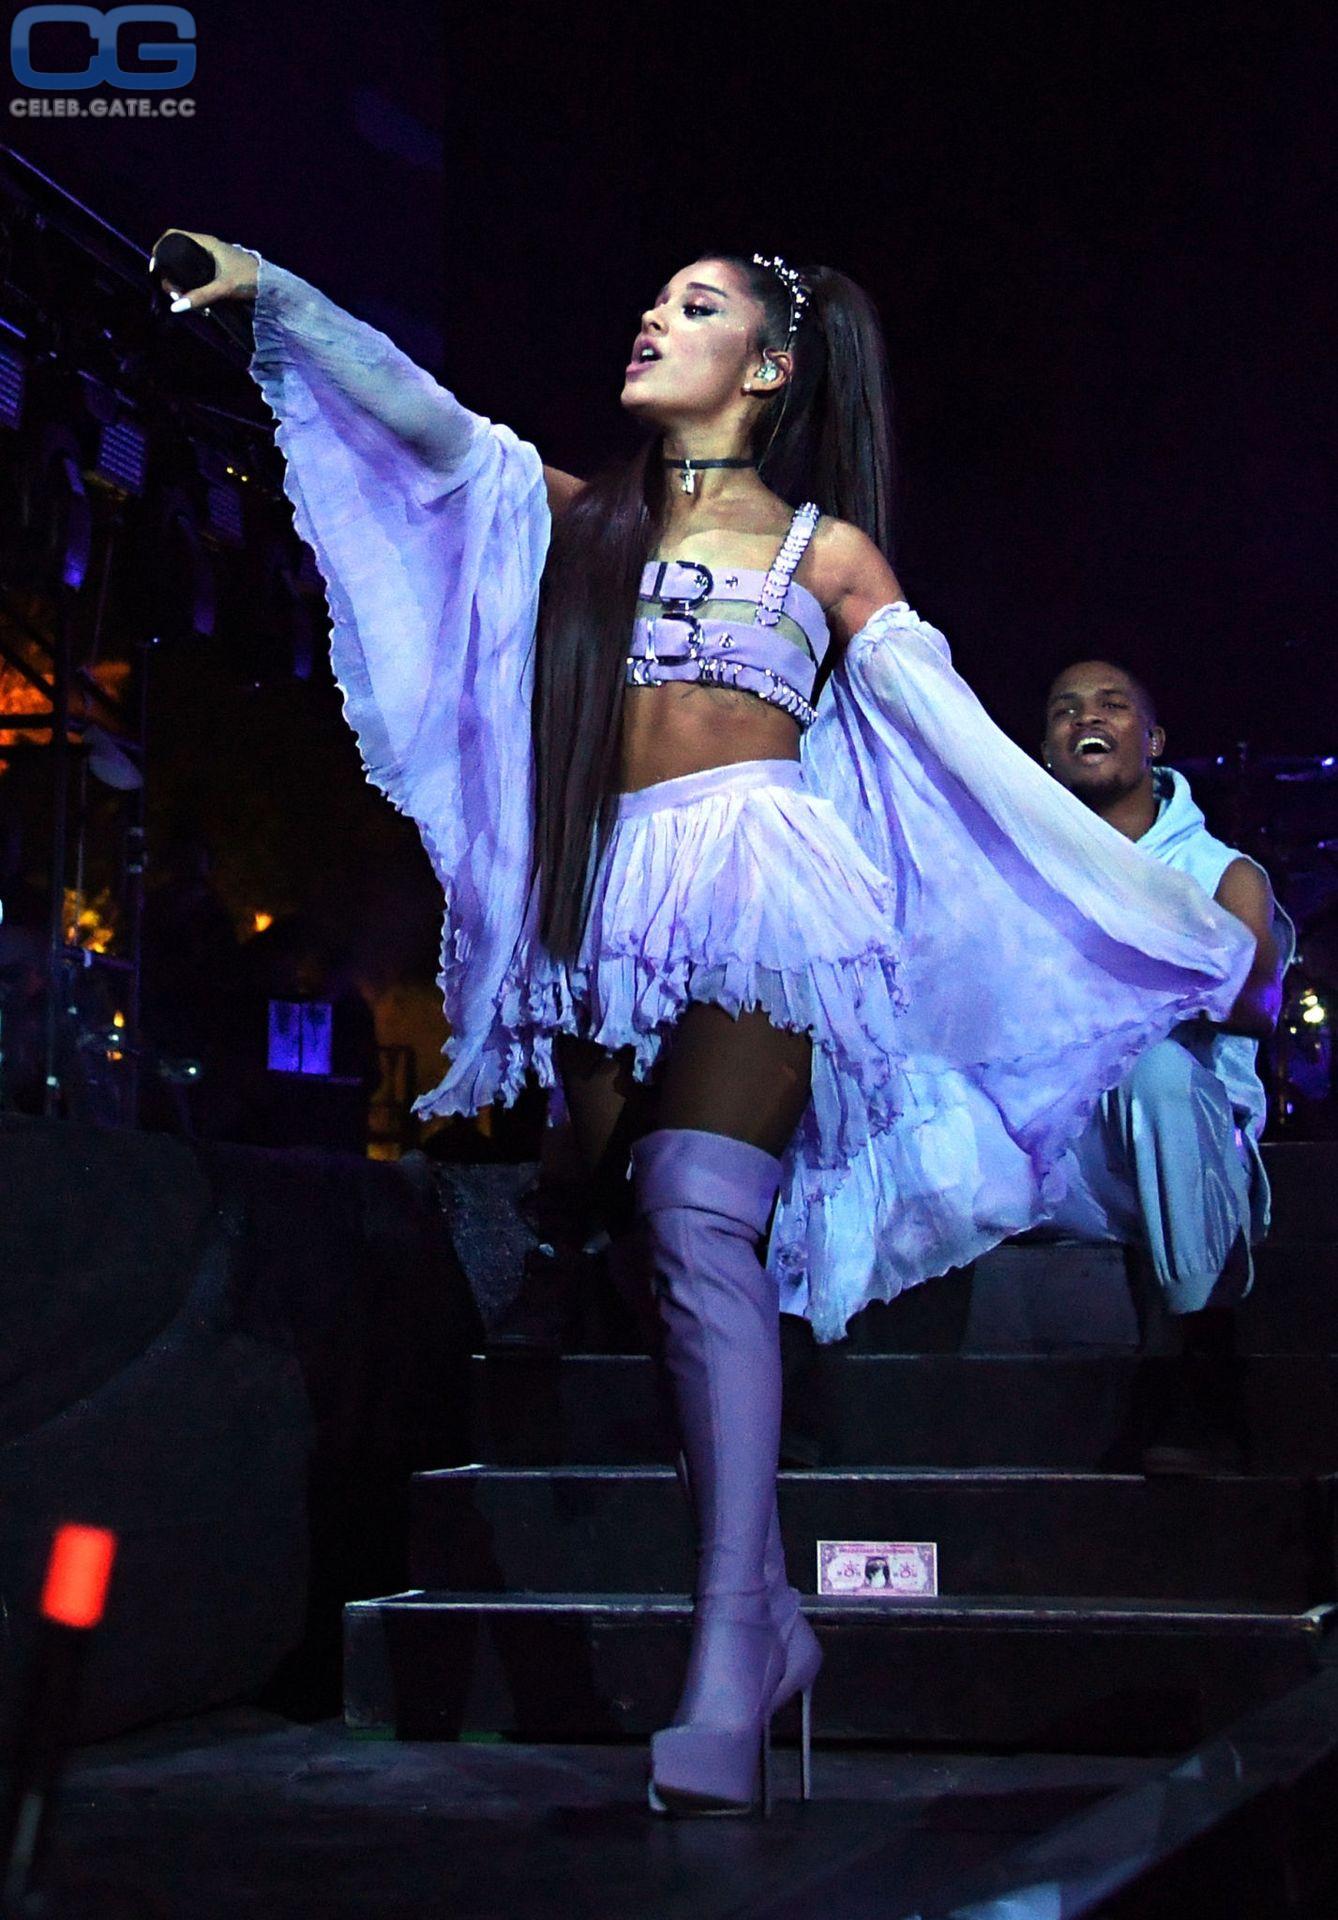 Ariana Grande overknees